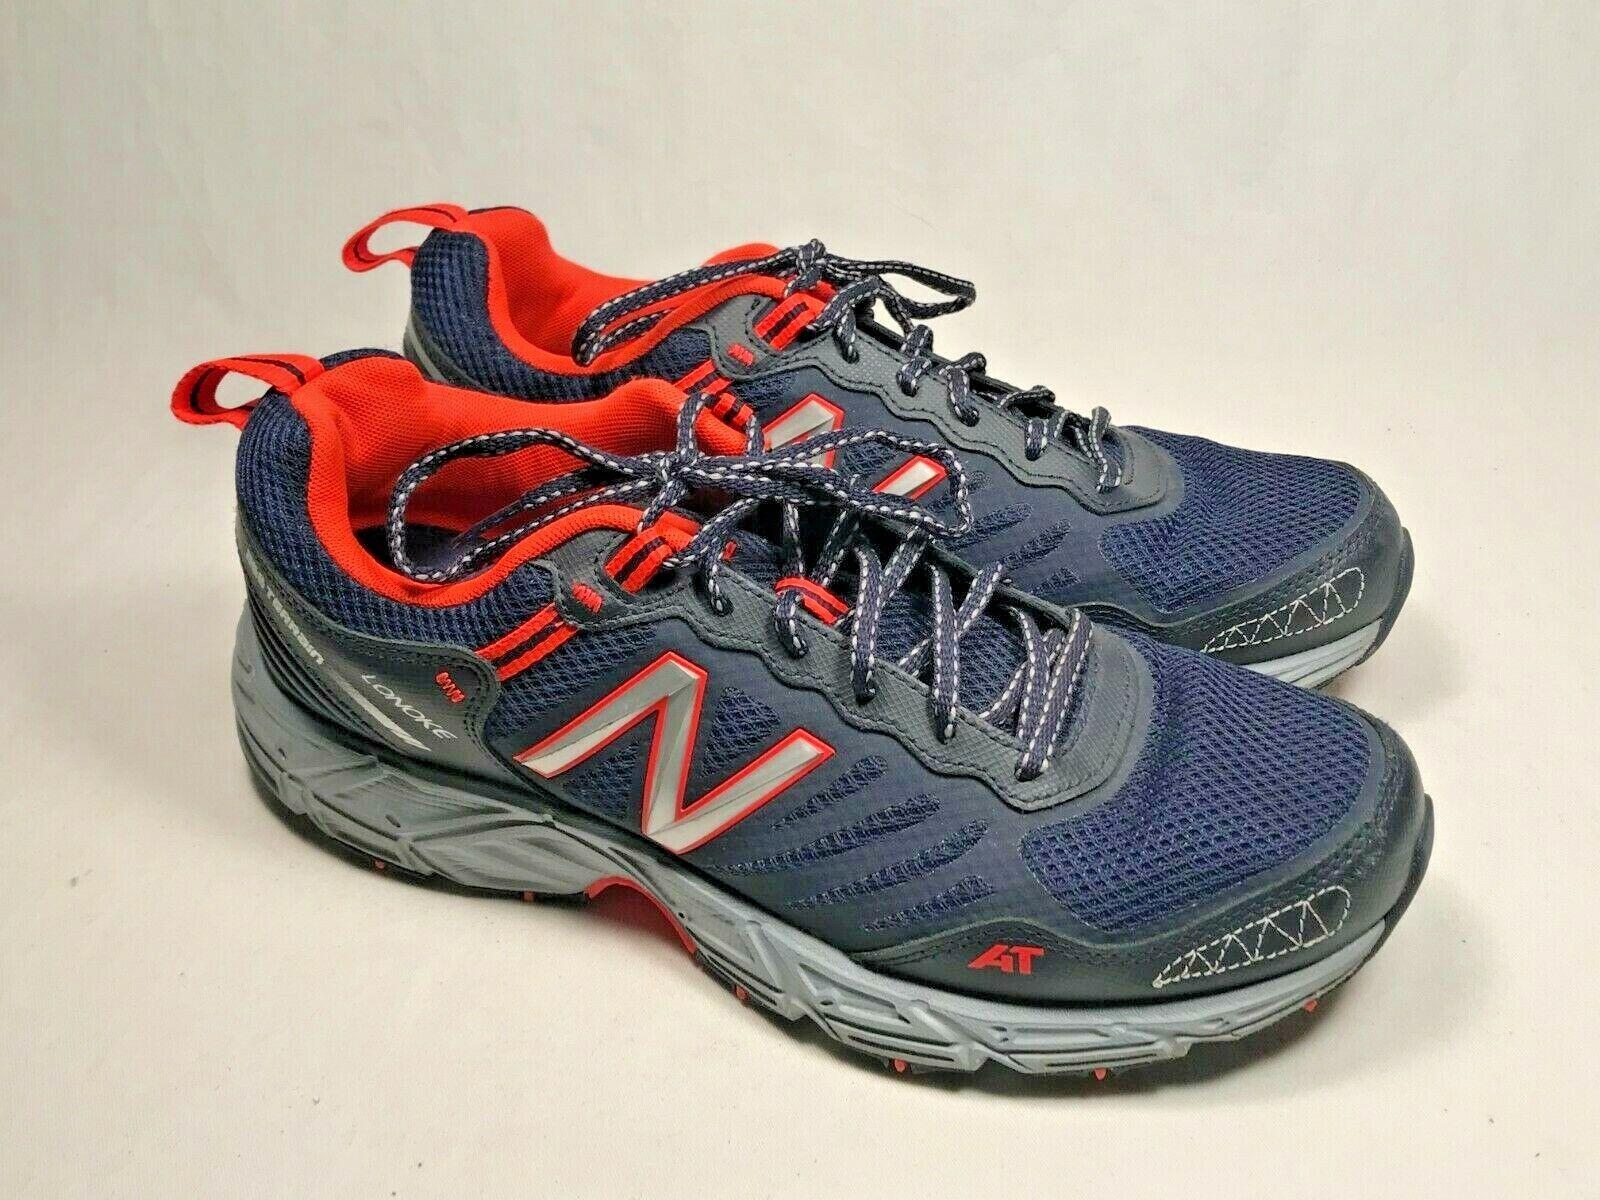 b0c277854cf New Balance Lonoke Terrain Multi-color Running shoes Men 11.5 D Trail All  npviso5714-Athletic Shoes